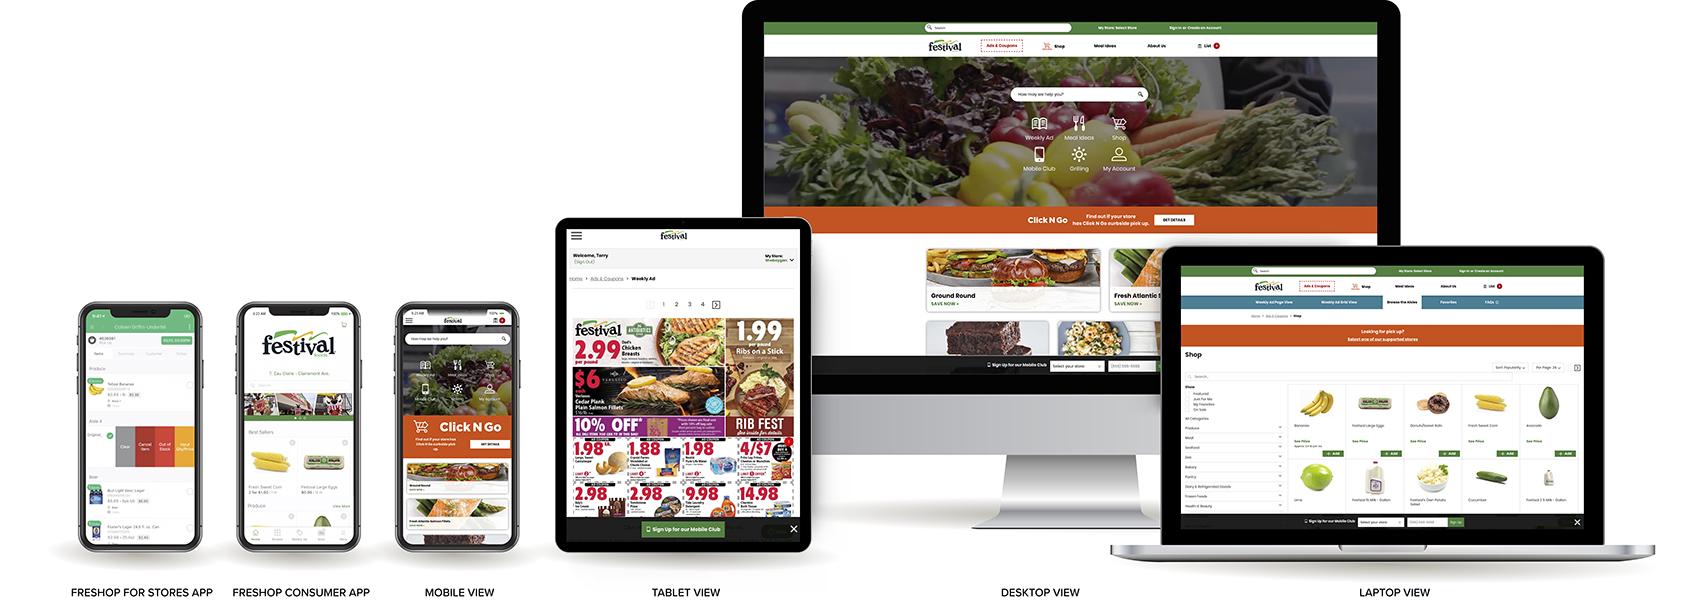 Freshop Showcase: Festival Foods